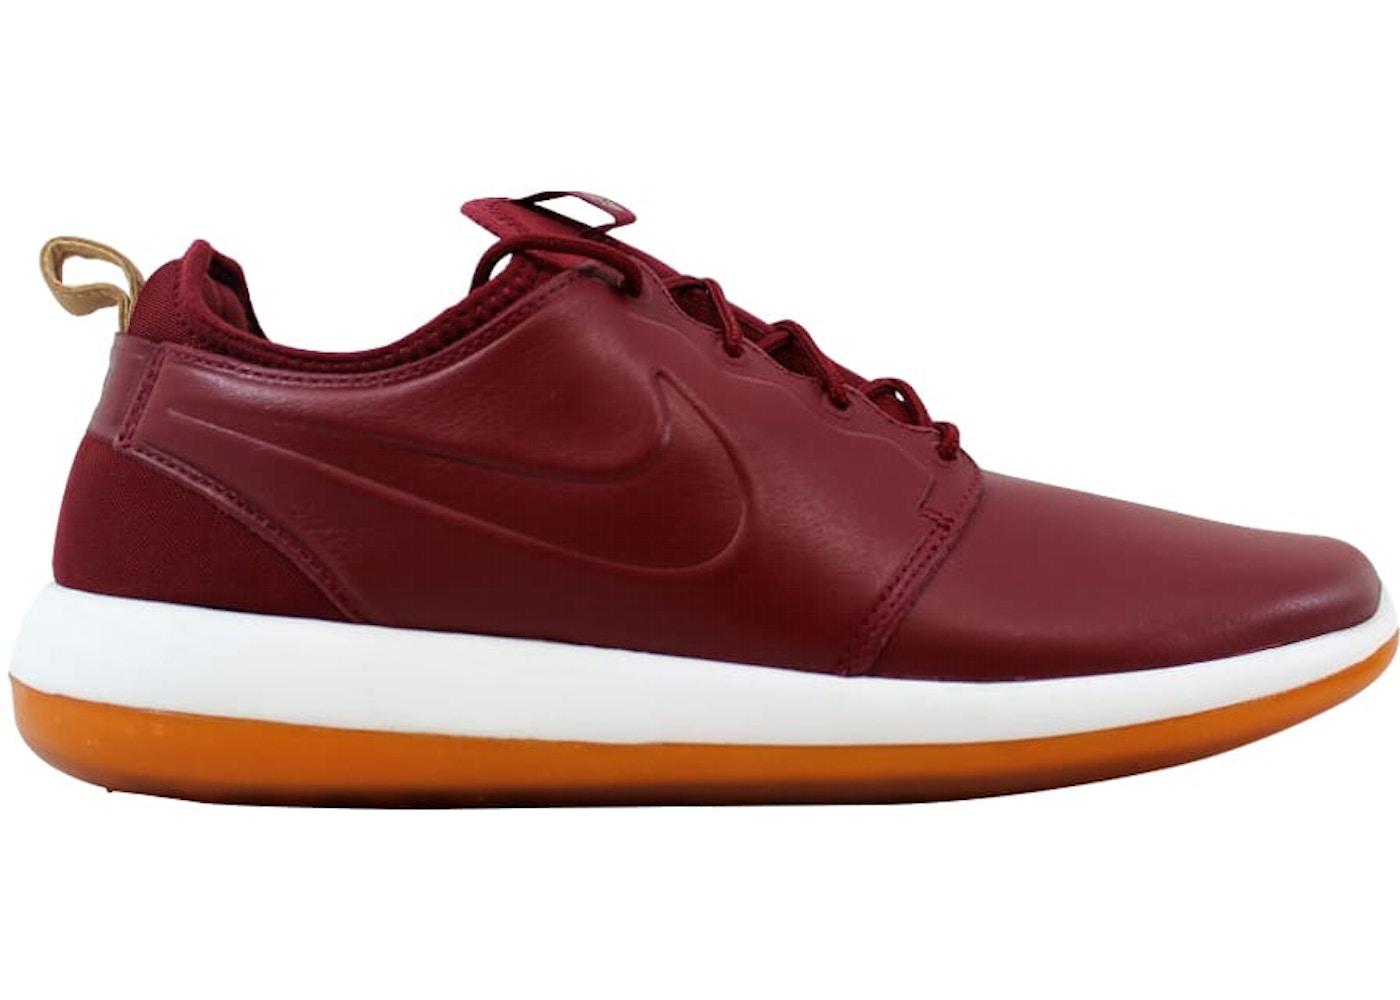 Empresa los padres de crianza hasta ahora  Nike Roshe Two Leather Premium Team Red/Team Red-White - 881987-600